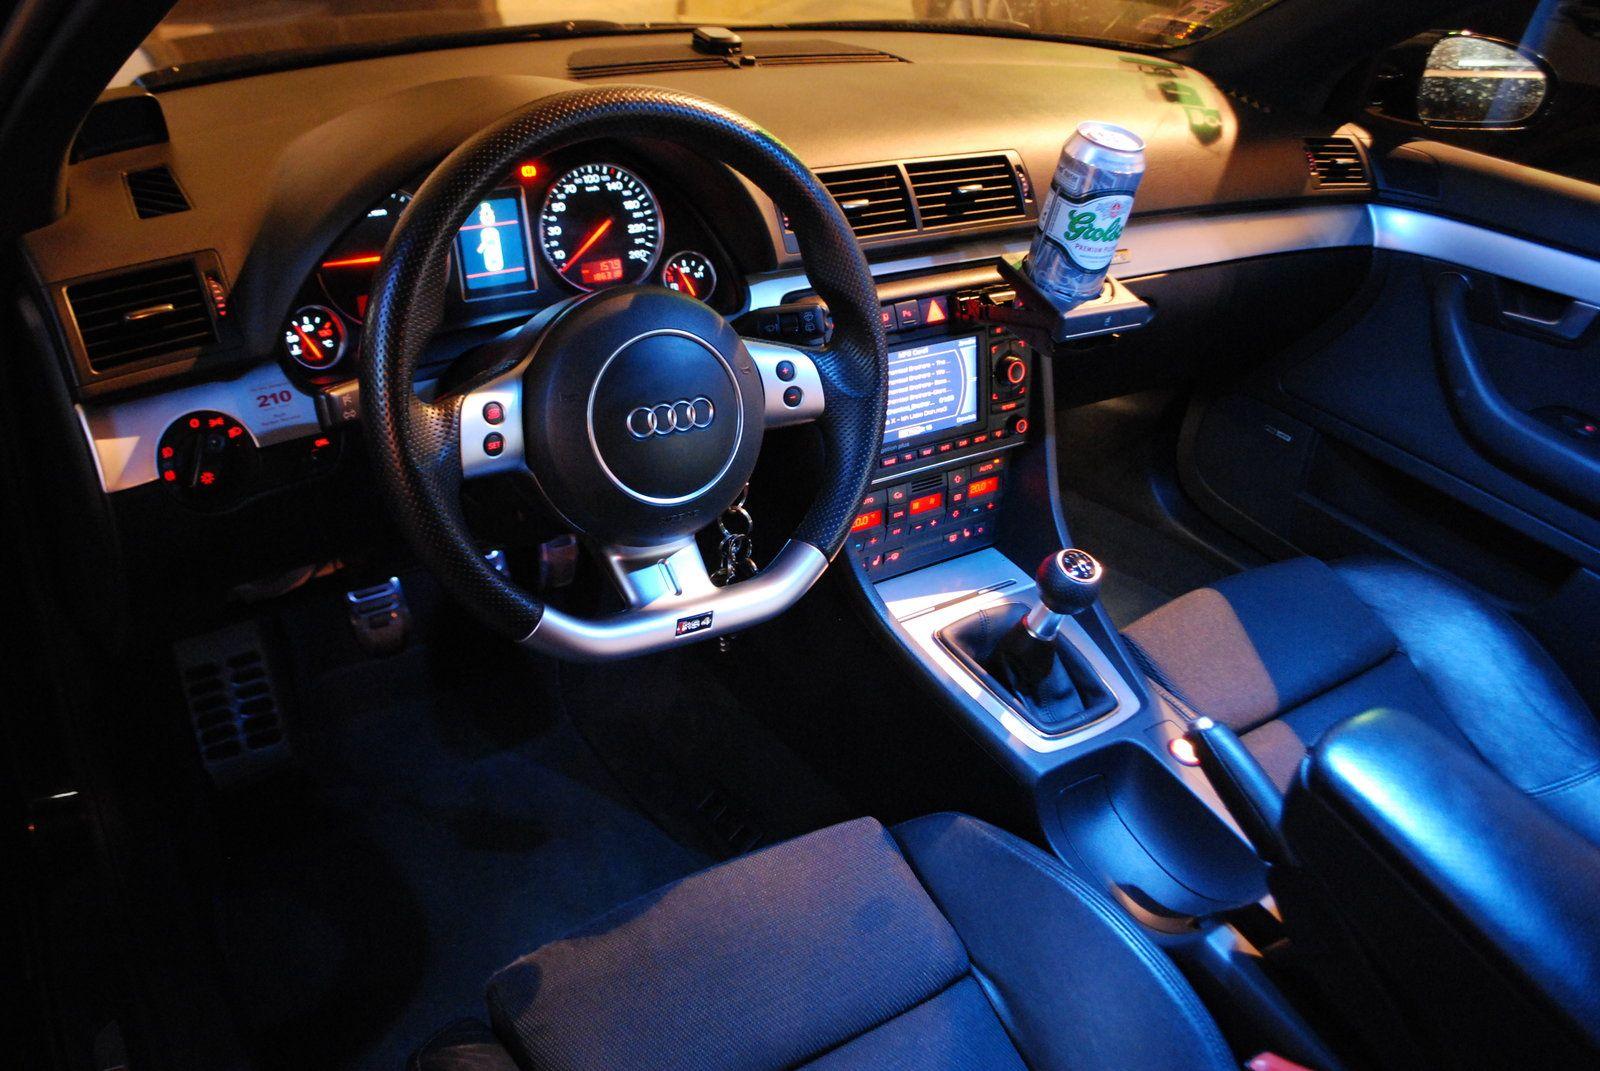 Audi A4 S Line 1 9 Tdi Diesel Edition Tdi Audi A4 Audi